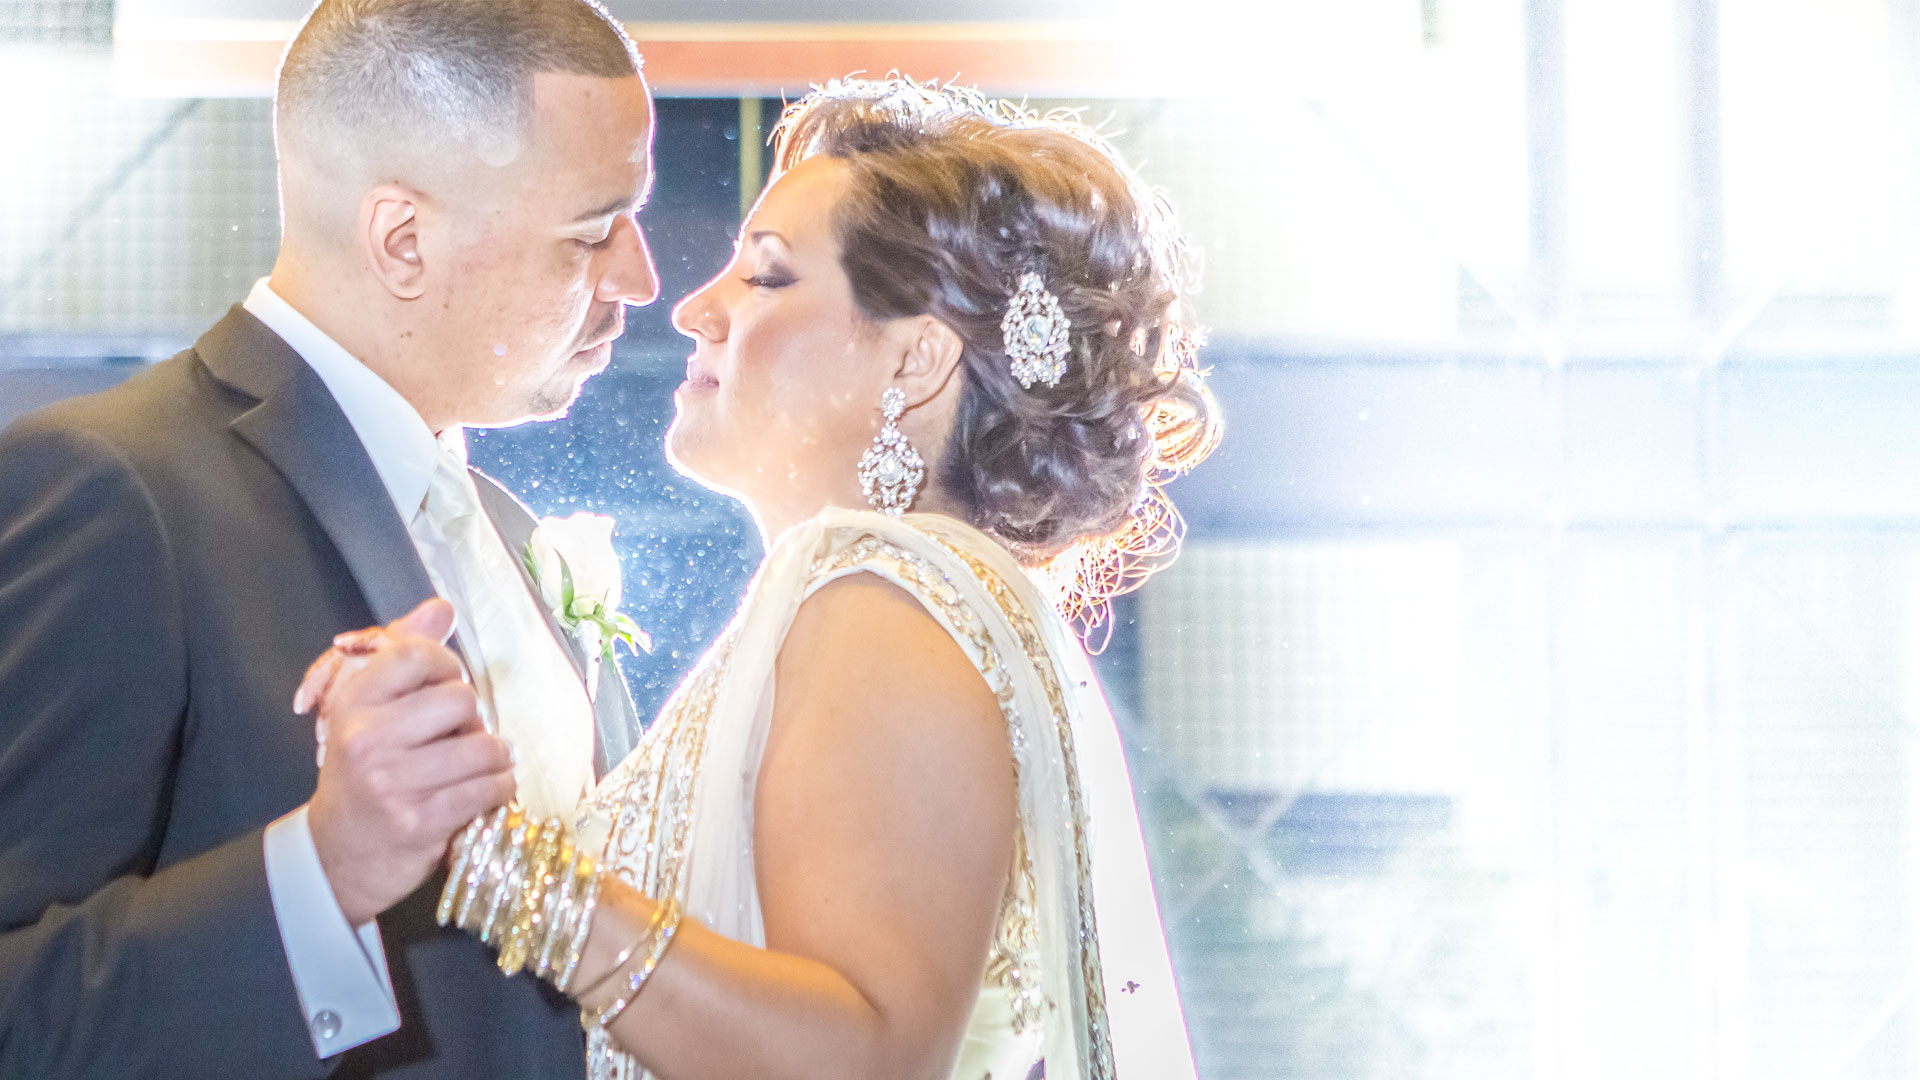 epicskypictures_ceremony_photography_wedding_proposal_bridetobe_toronto_dress_indian_couple_thisisepic_mexico_moon_palace_ontariowebsite